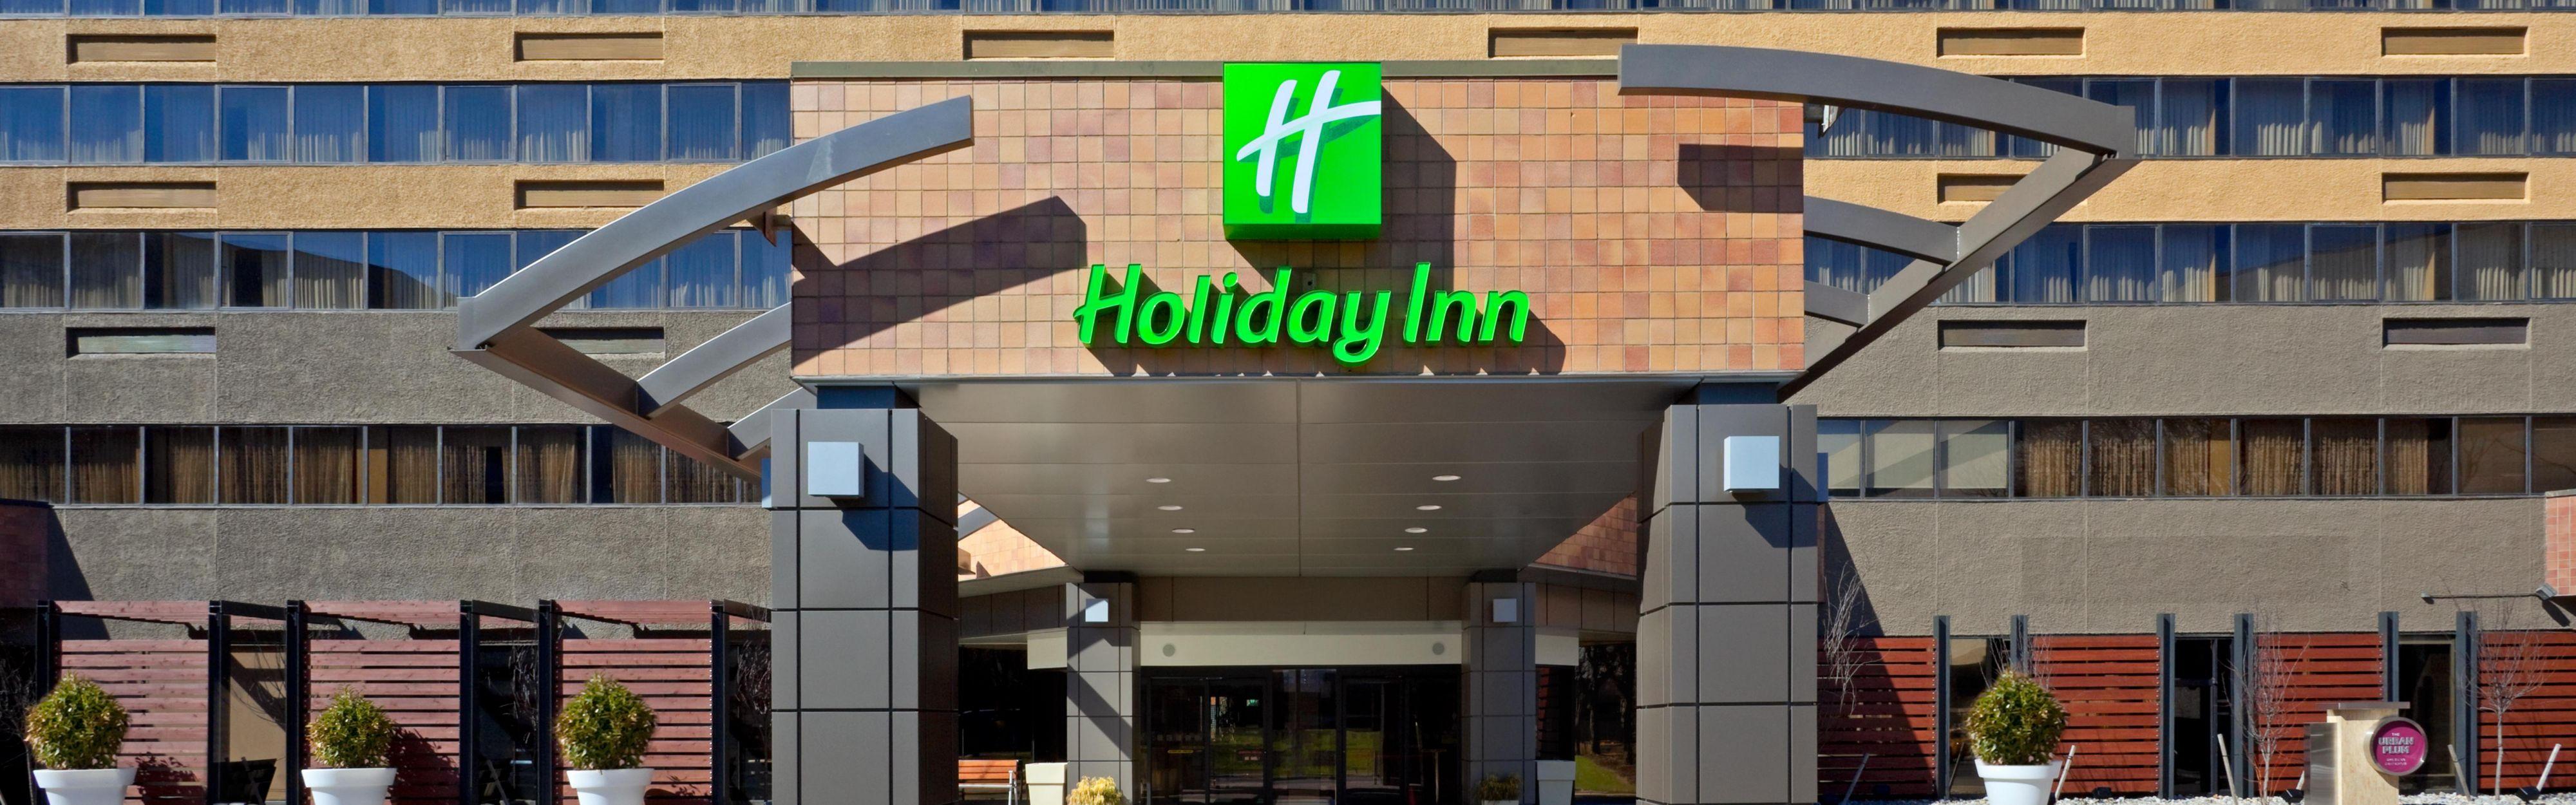 Holiday Inn Secaucus Meadowlands Secaucus New Jersey Nj